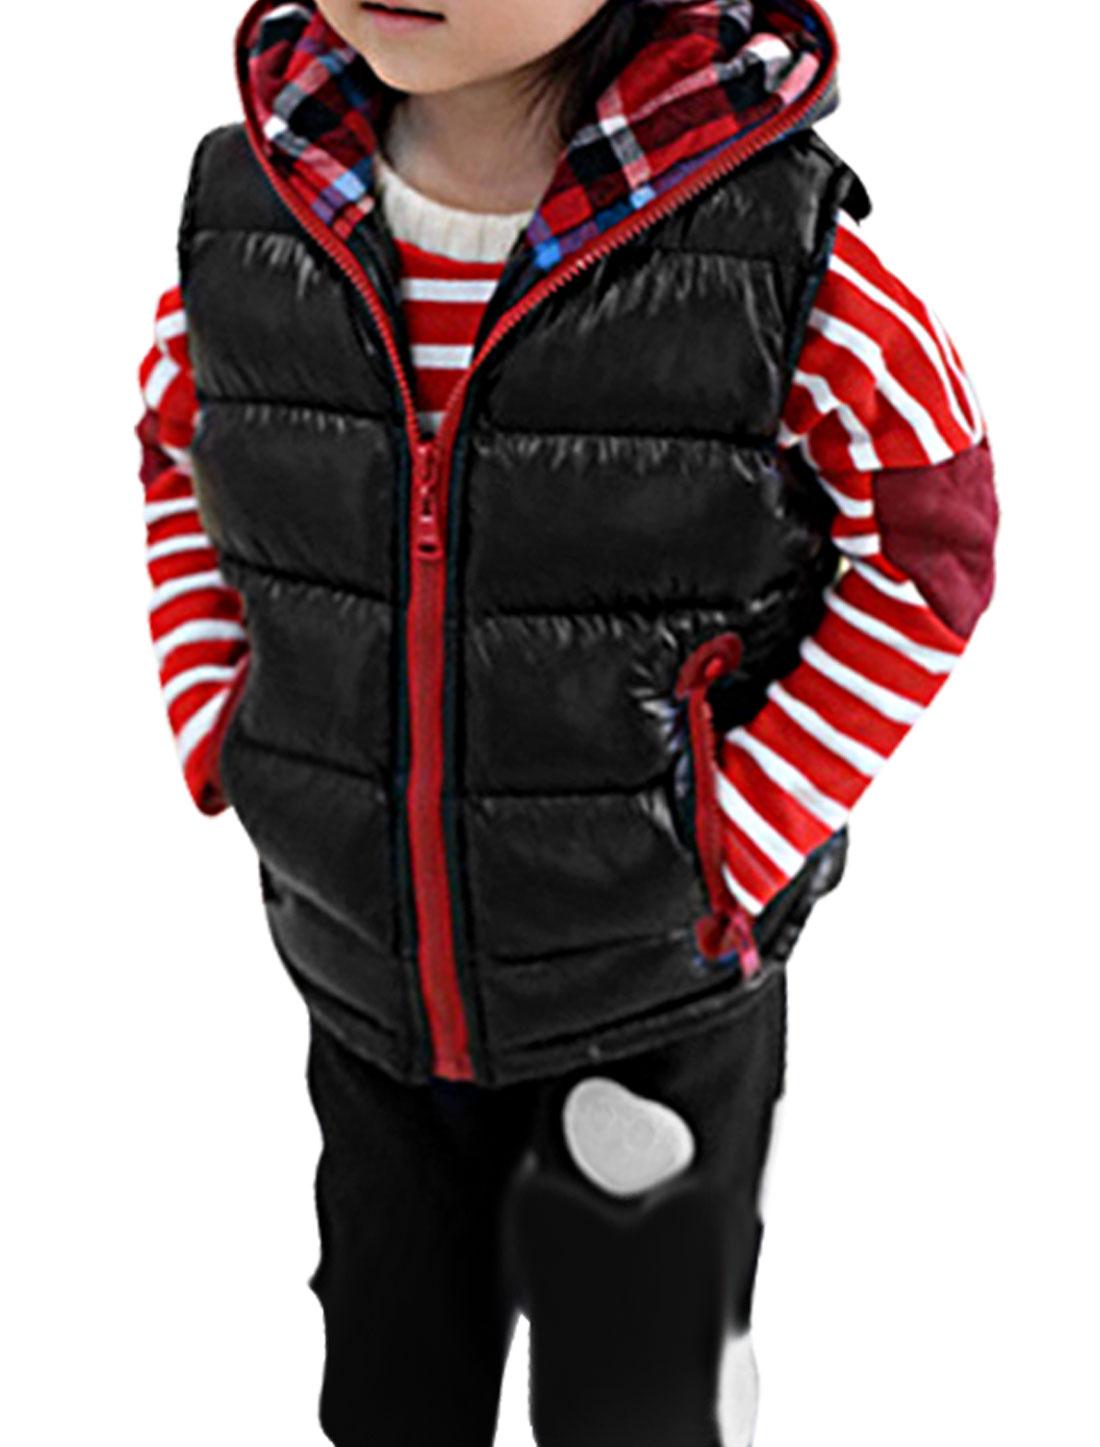 Girls Hooded Zip Closure Pockets Front Warm Vest Black 7